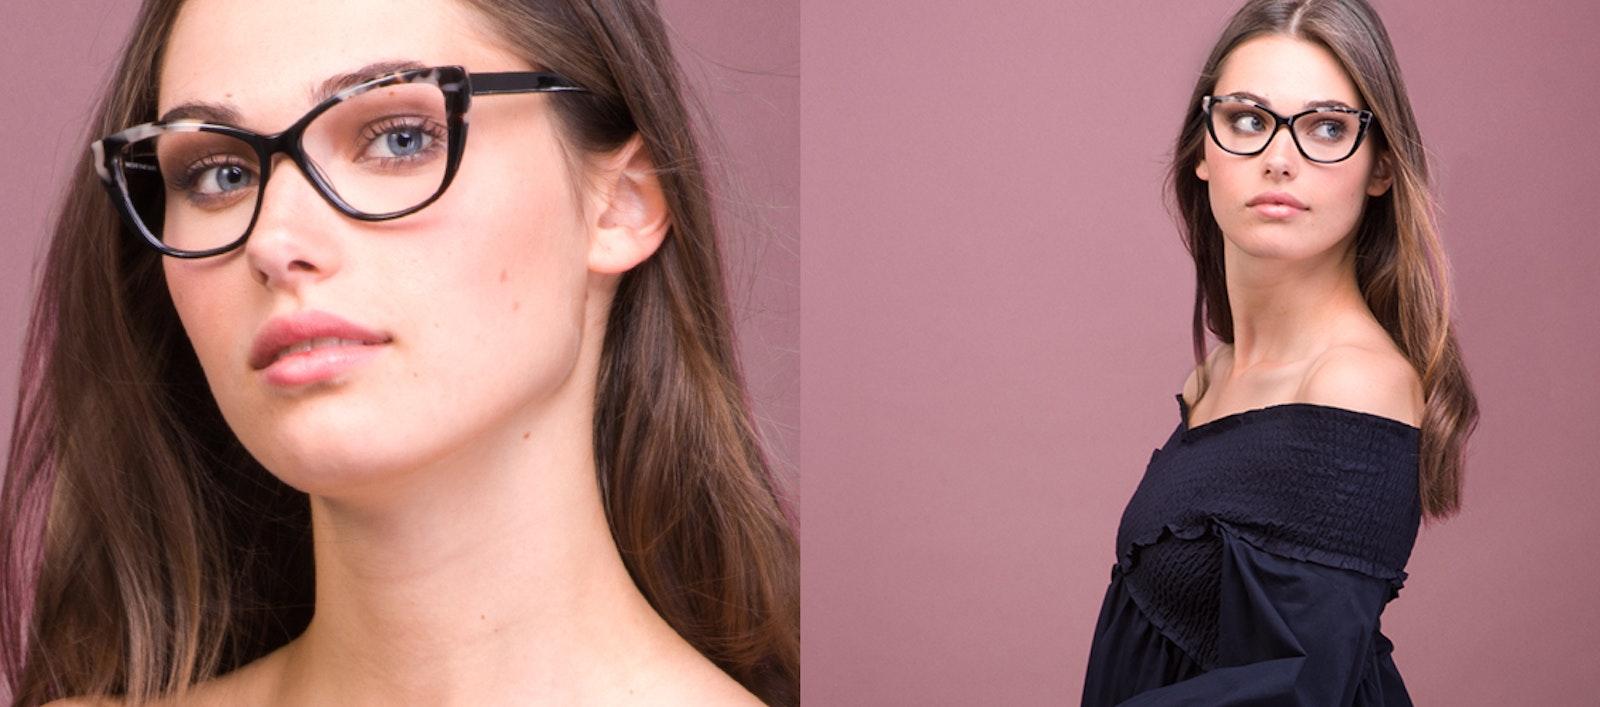 92a4ccbe89a6 Affordable Fashion Glasses Cat Eye Daring Cateye Eyeglasses Women Dolled Up Ebony  Granite